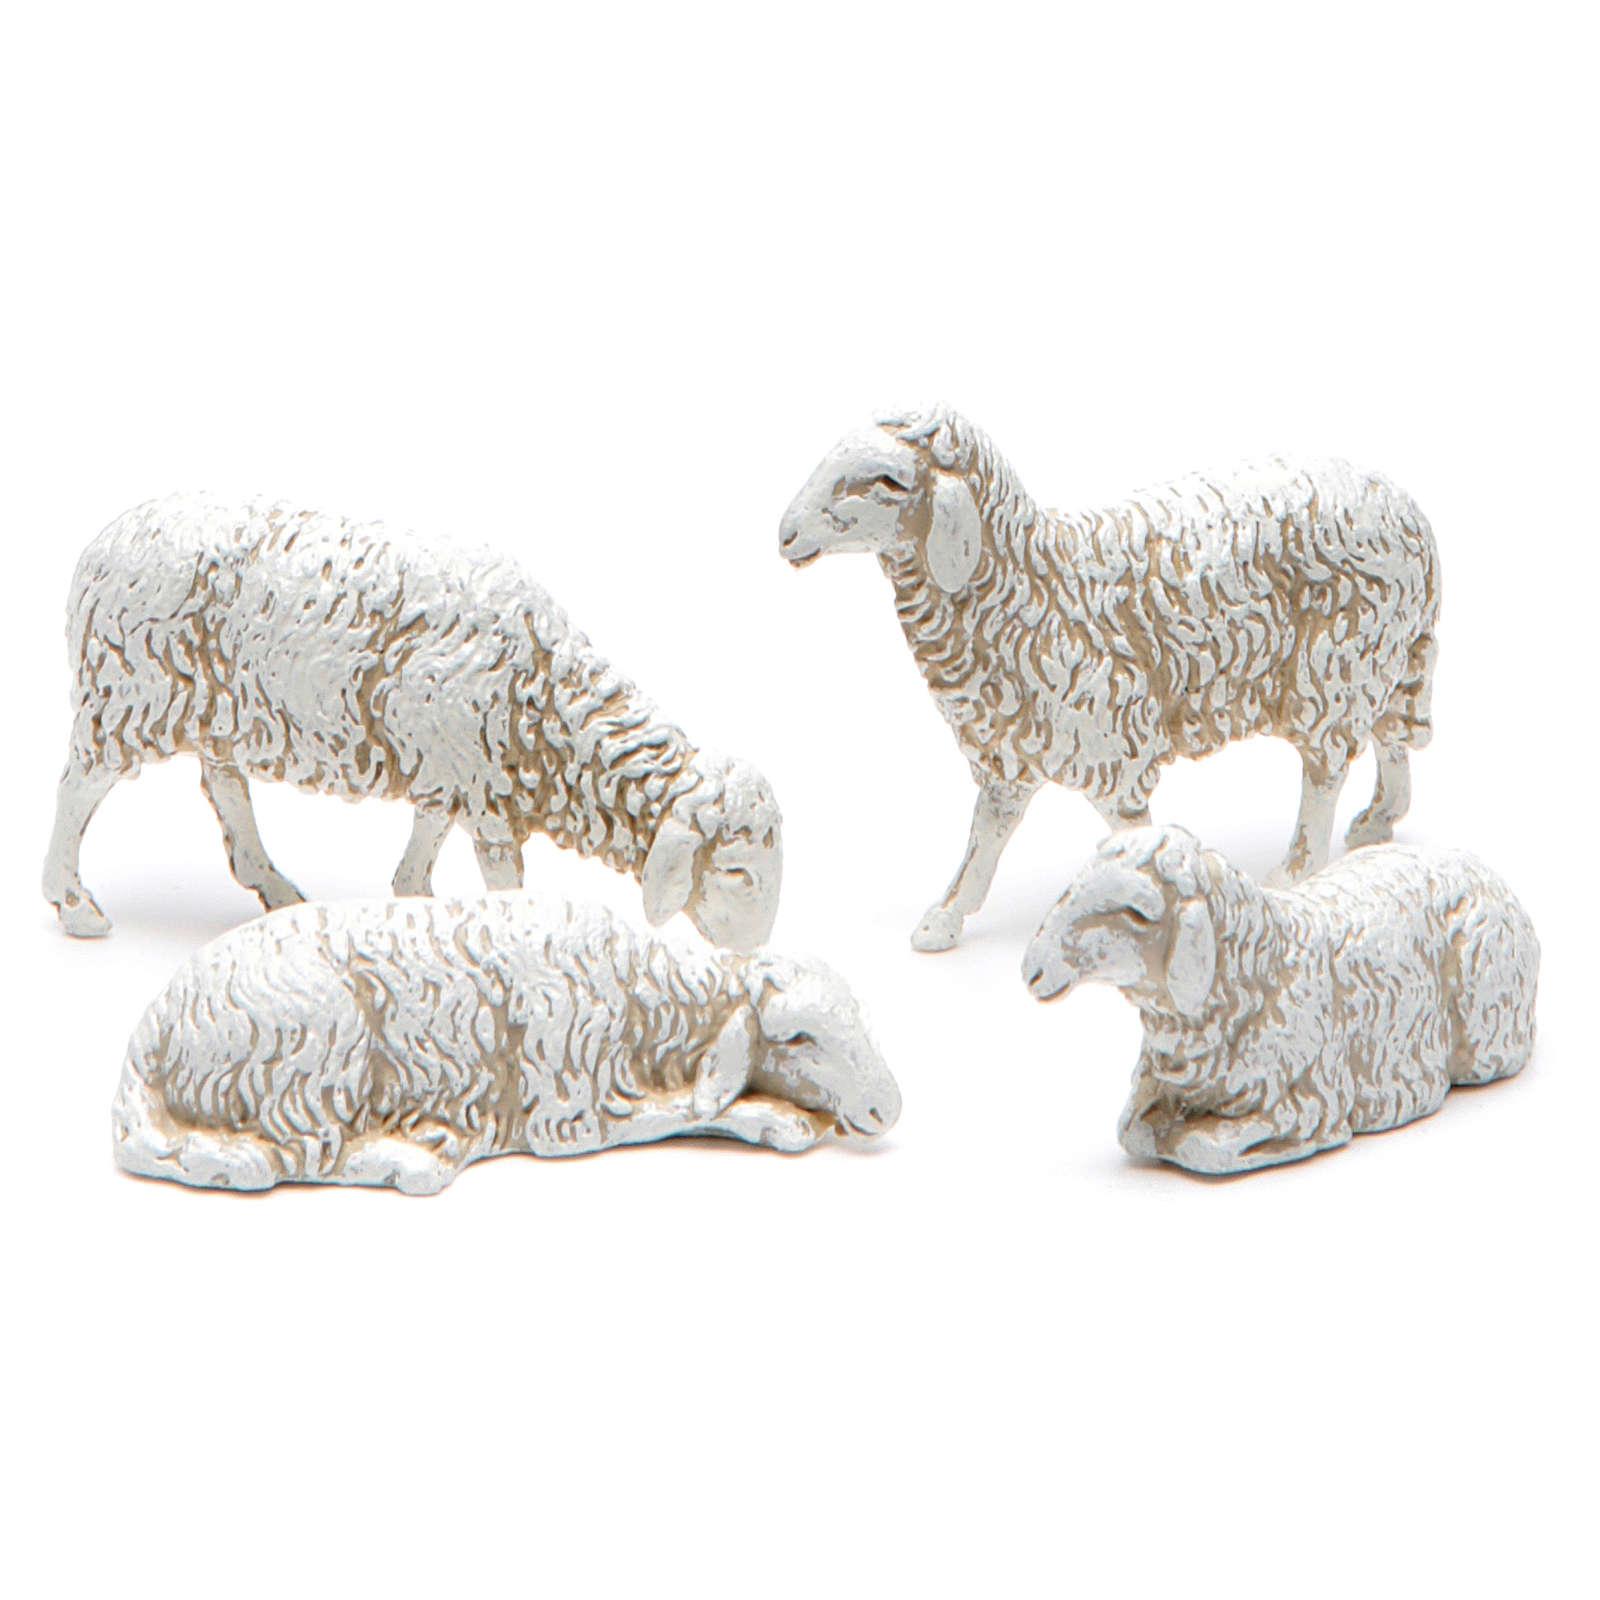 Pecorelle assortite 10 cm presepe Moranduzzo 12 pezzi 4